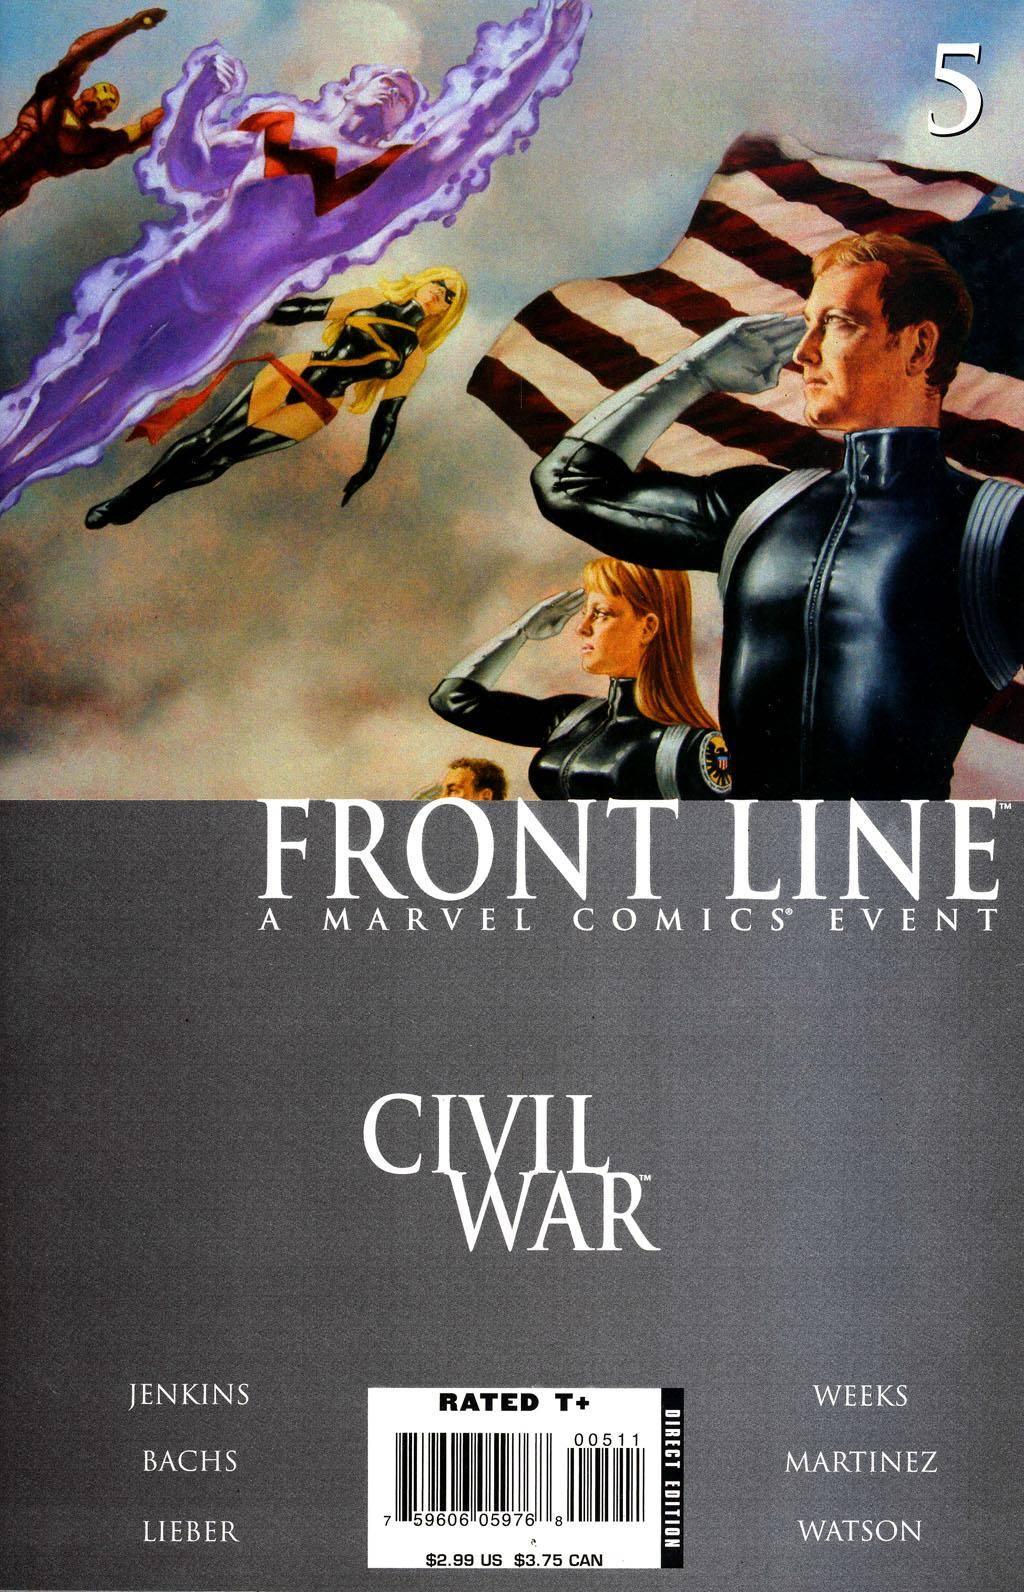 Civil War - Frontline 05